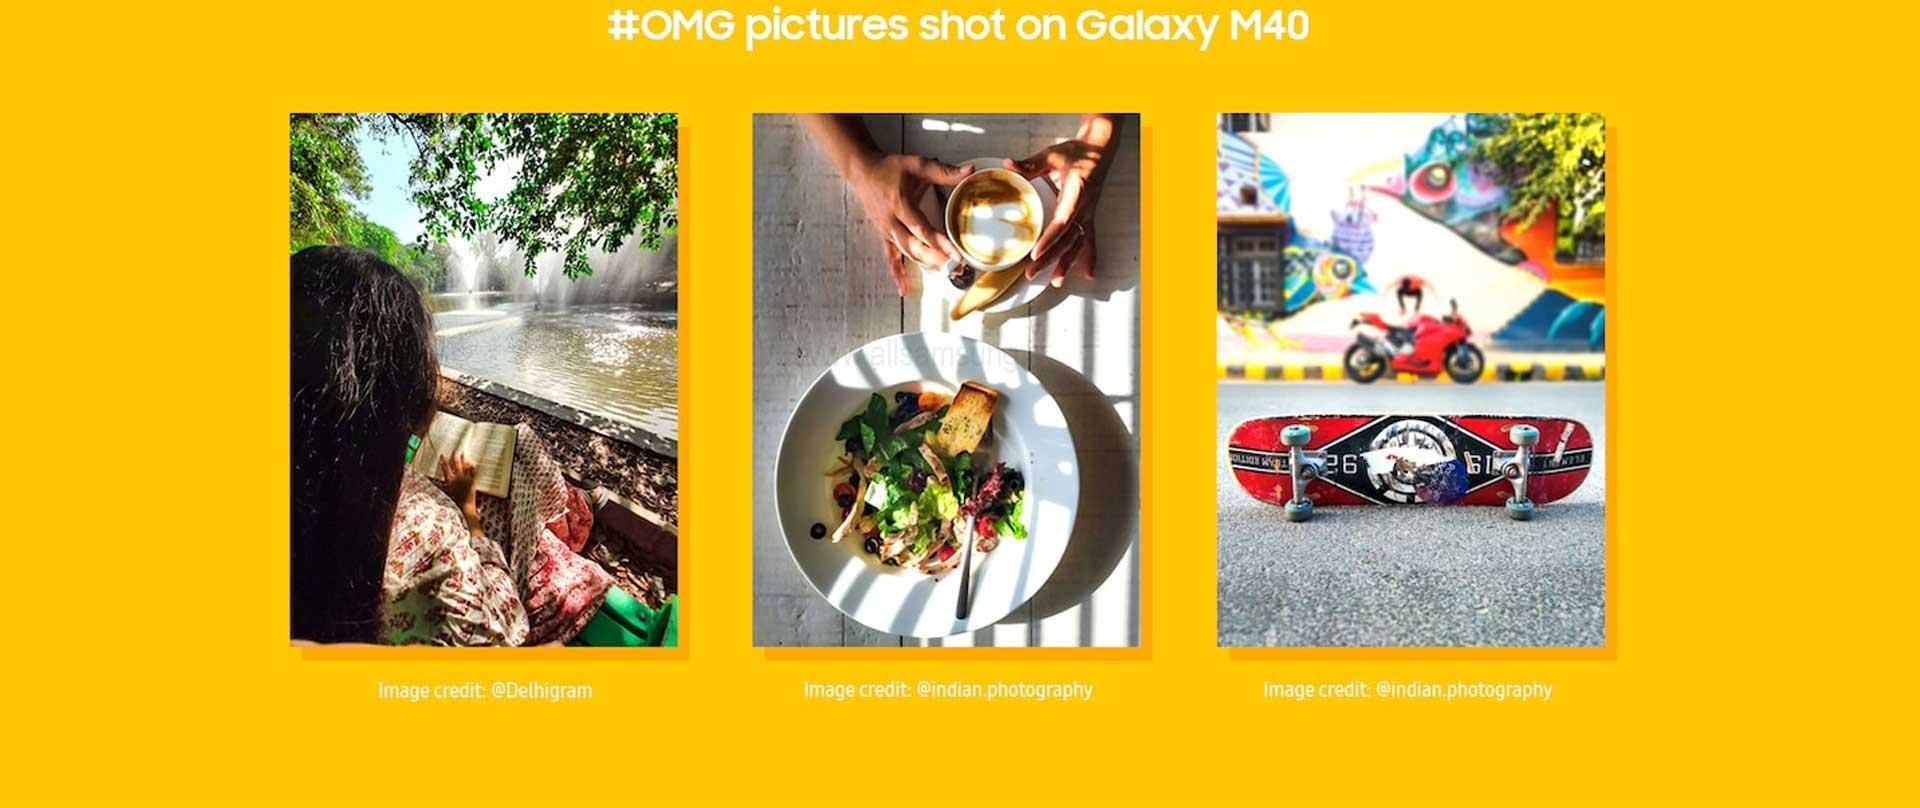 Samsung Galaxy M40 SM-M405FD